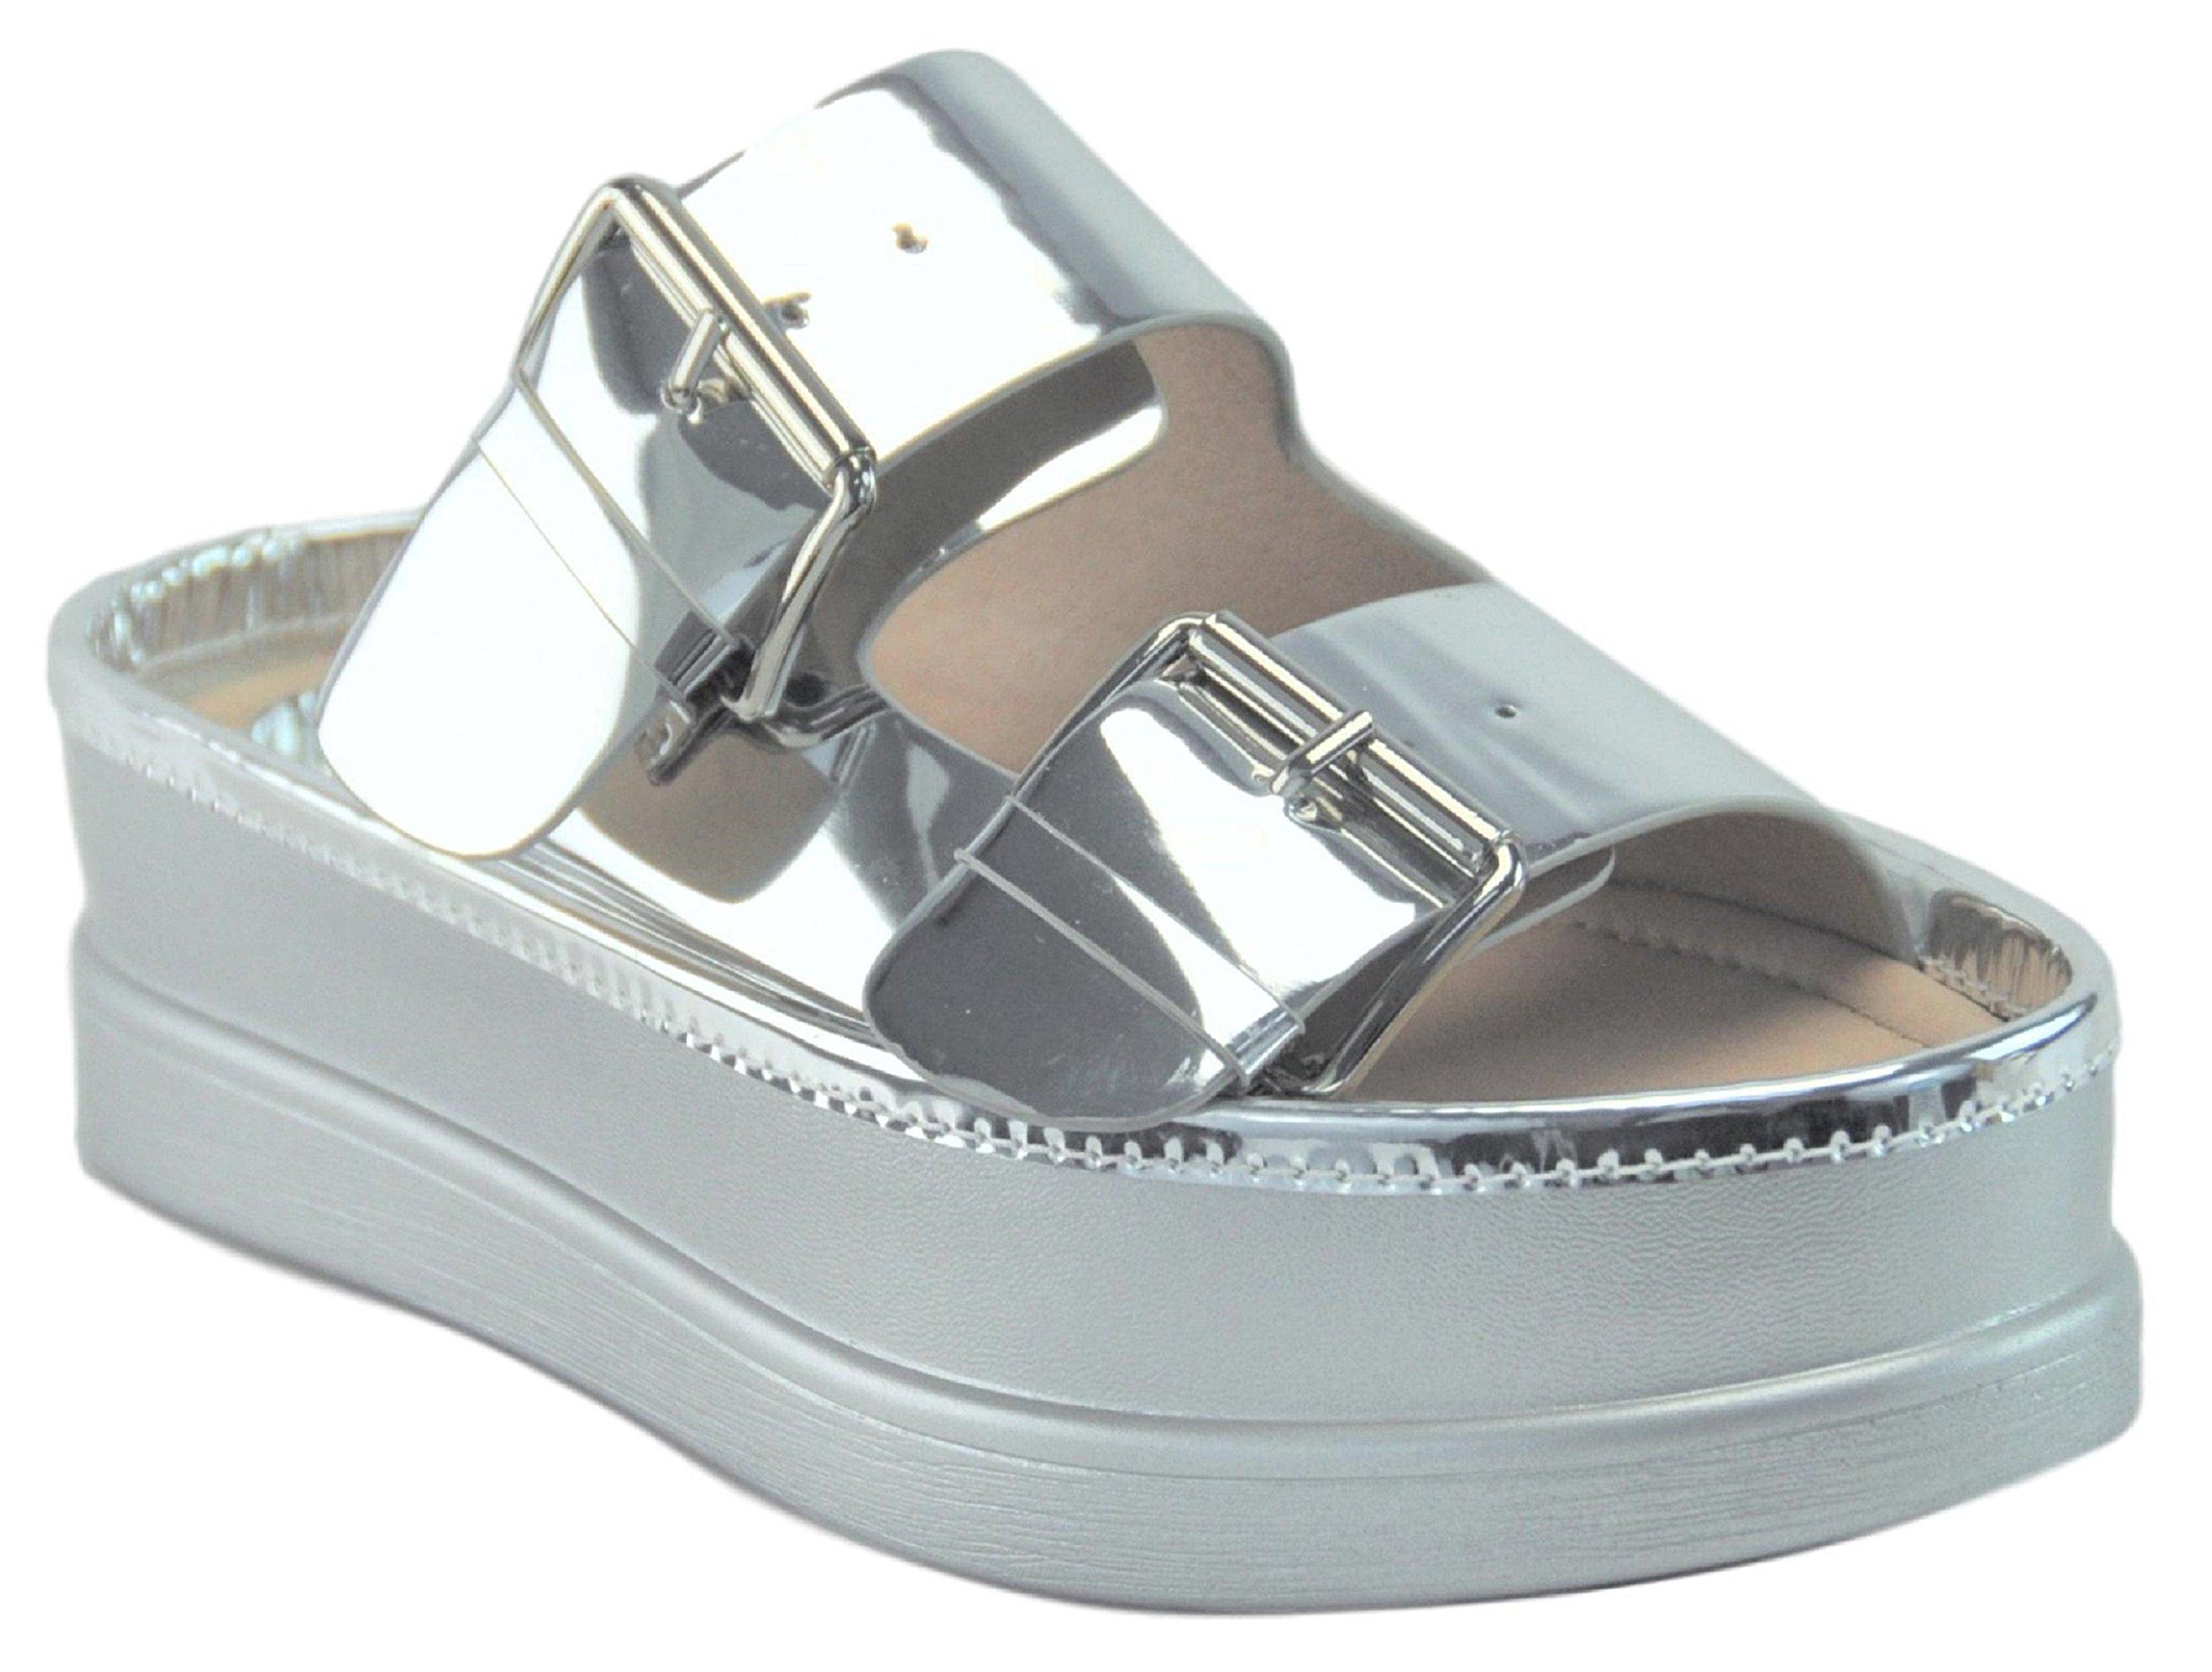 Adelle Popular Silver Slip On Round Toe Top Comfortable Boho Nice Cheap Junior Fashionable Sandalias Plataforma Tacon Cuna Sandal for Women Girl Teen (Size 6.5, Silver)